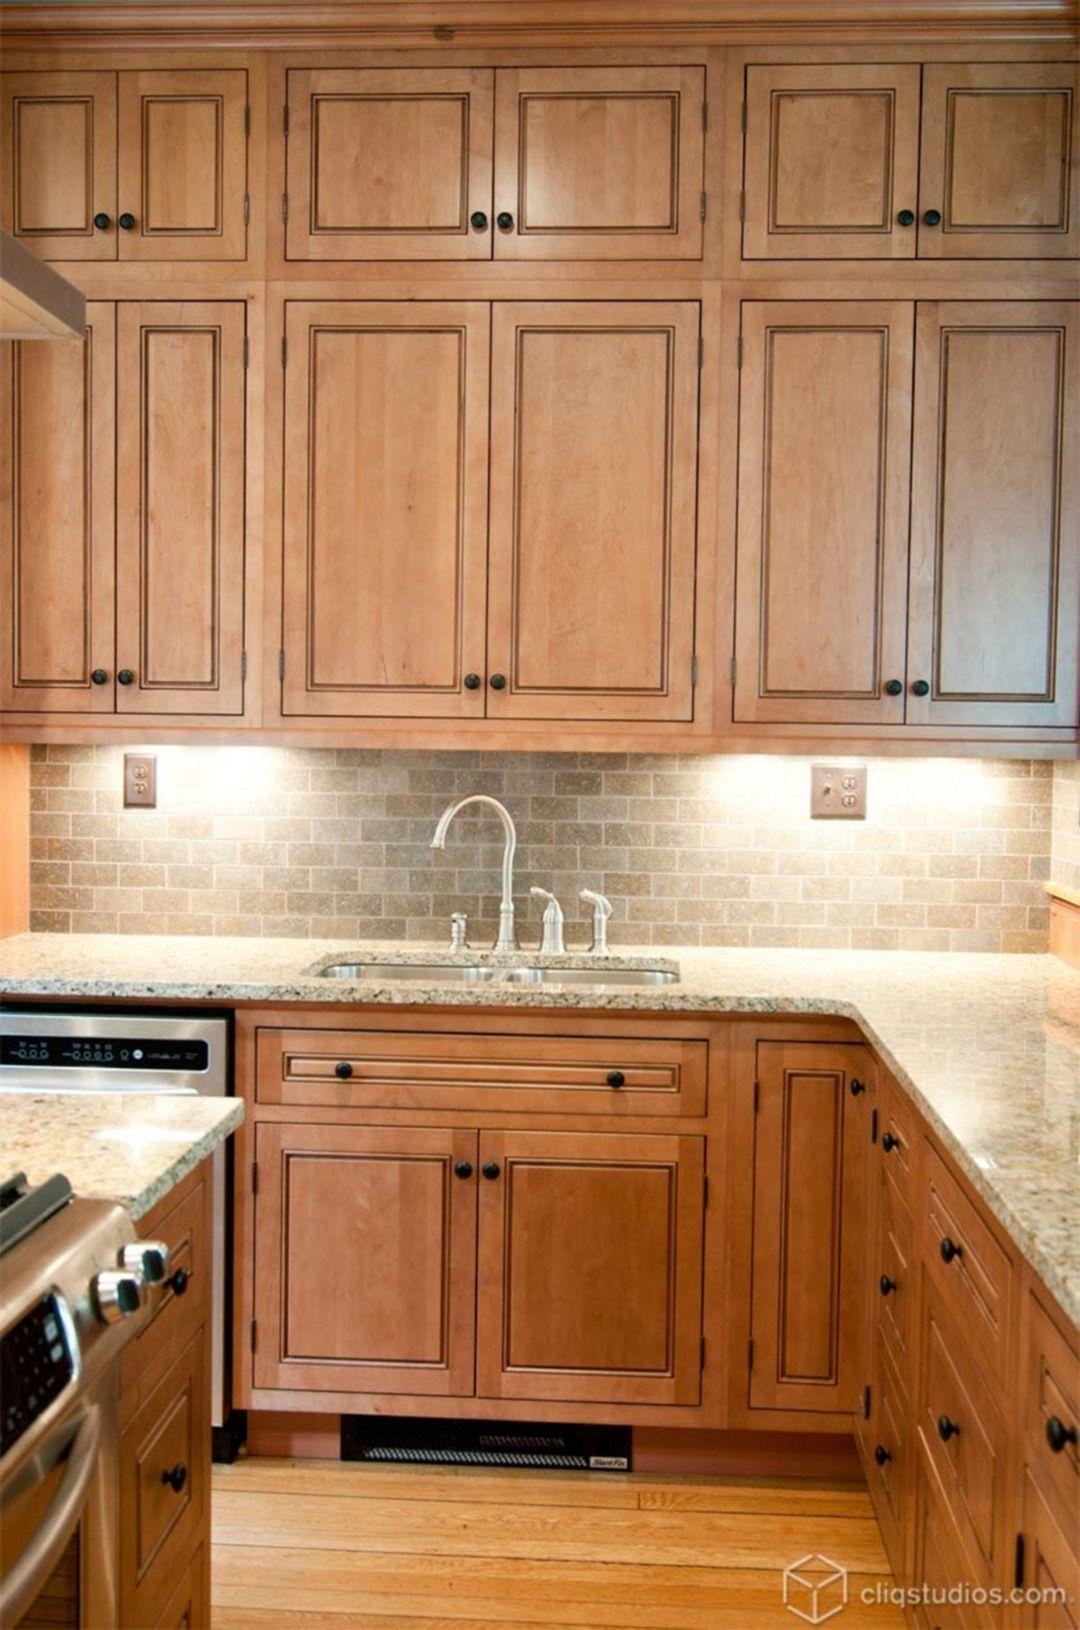 25+ Charming Kitchen Cabinet Decorating Ideas Using Oak ... on Maple Cabinet Kitchen Ideas  id=59267